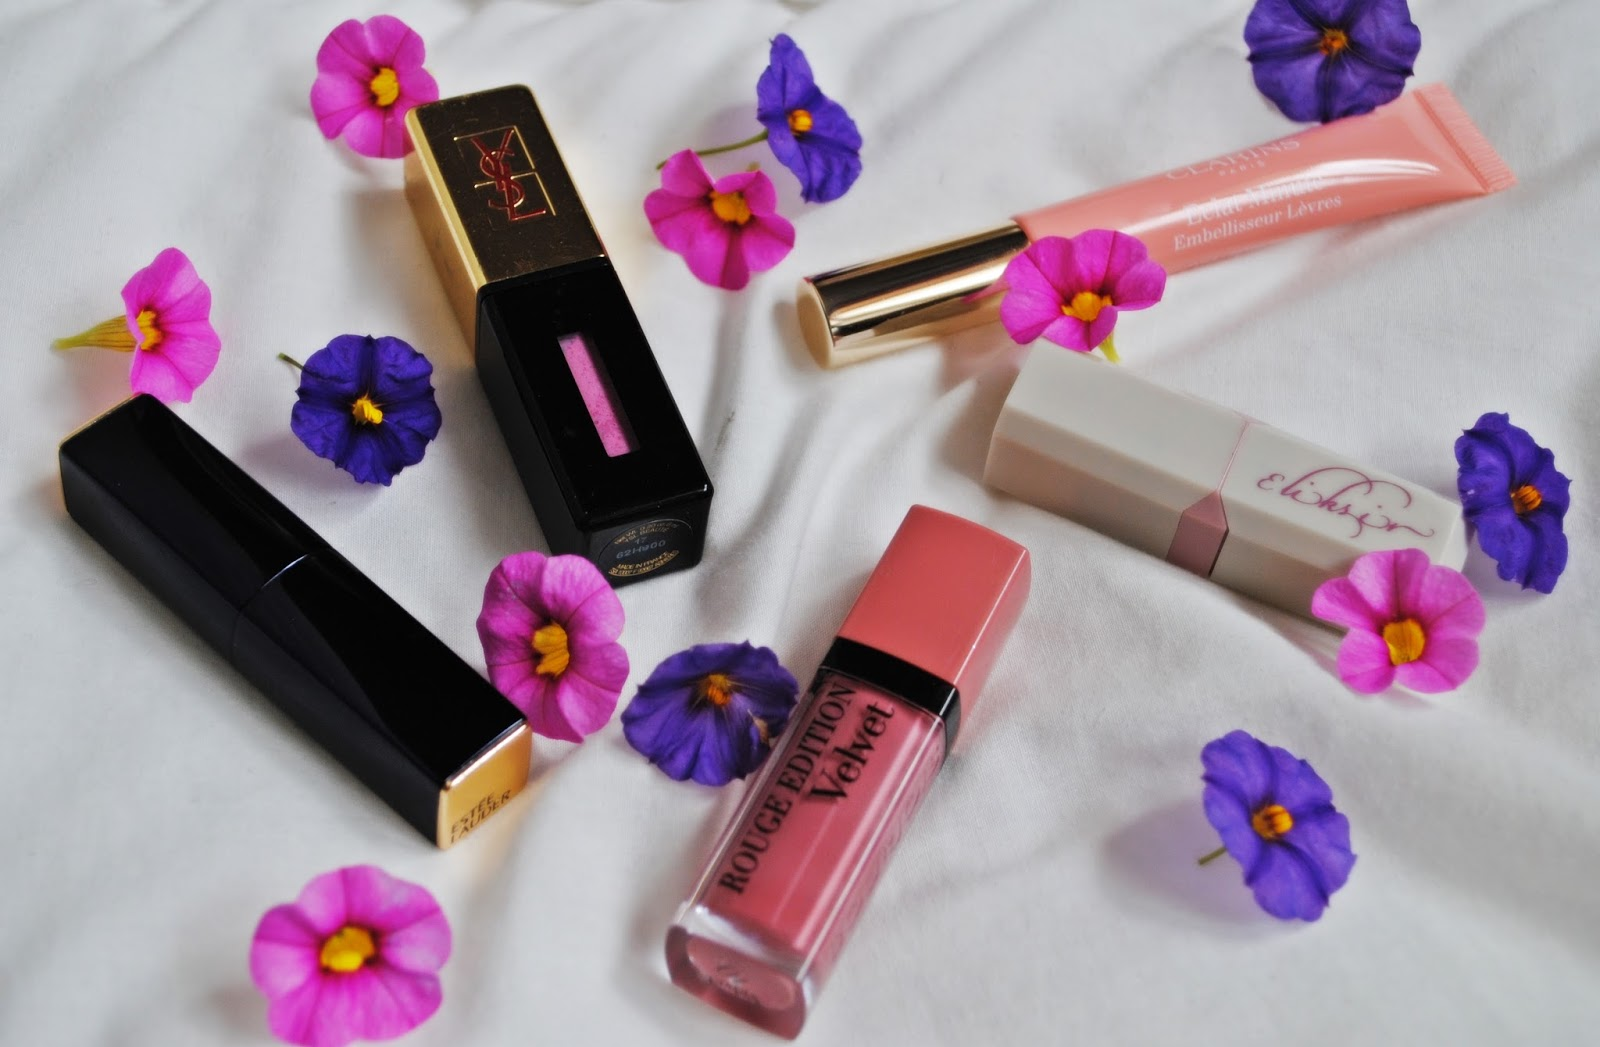 Top 5 produktów do ust Ysl, El, Clarins, wibo, Bourjois beautypediapatt.blogspot.com